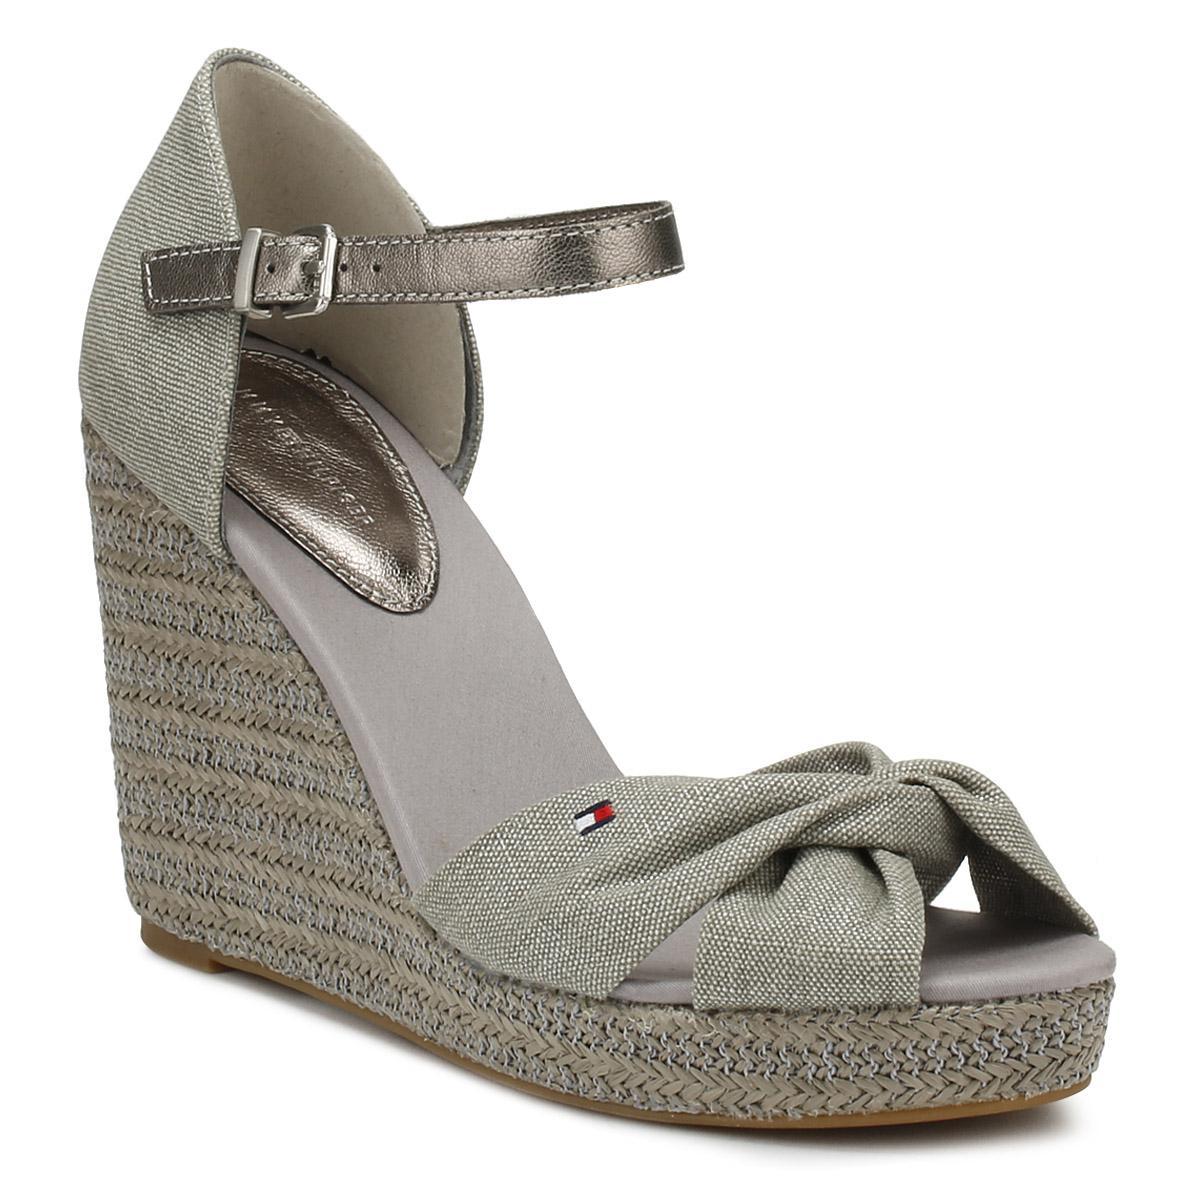 84495e36c224 Tommy Hilfiger Womens Light Grey Metallic Elena Wedge Sandals in ...